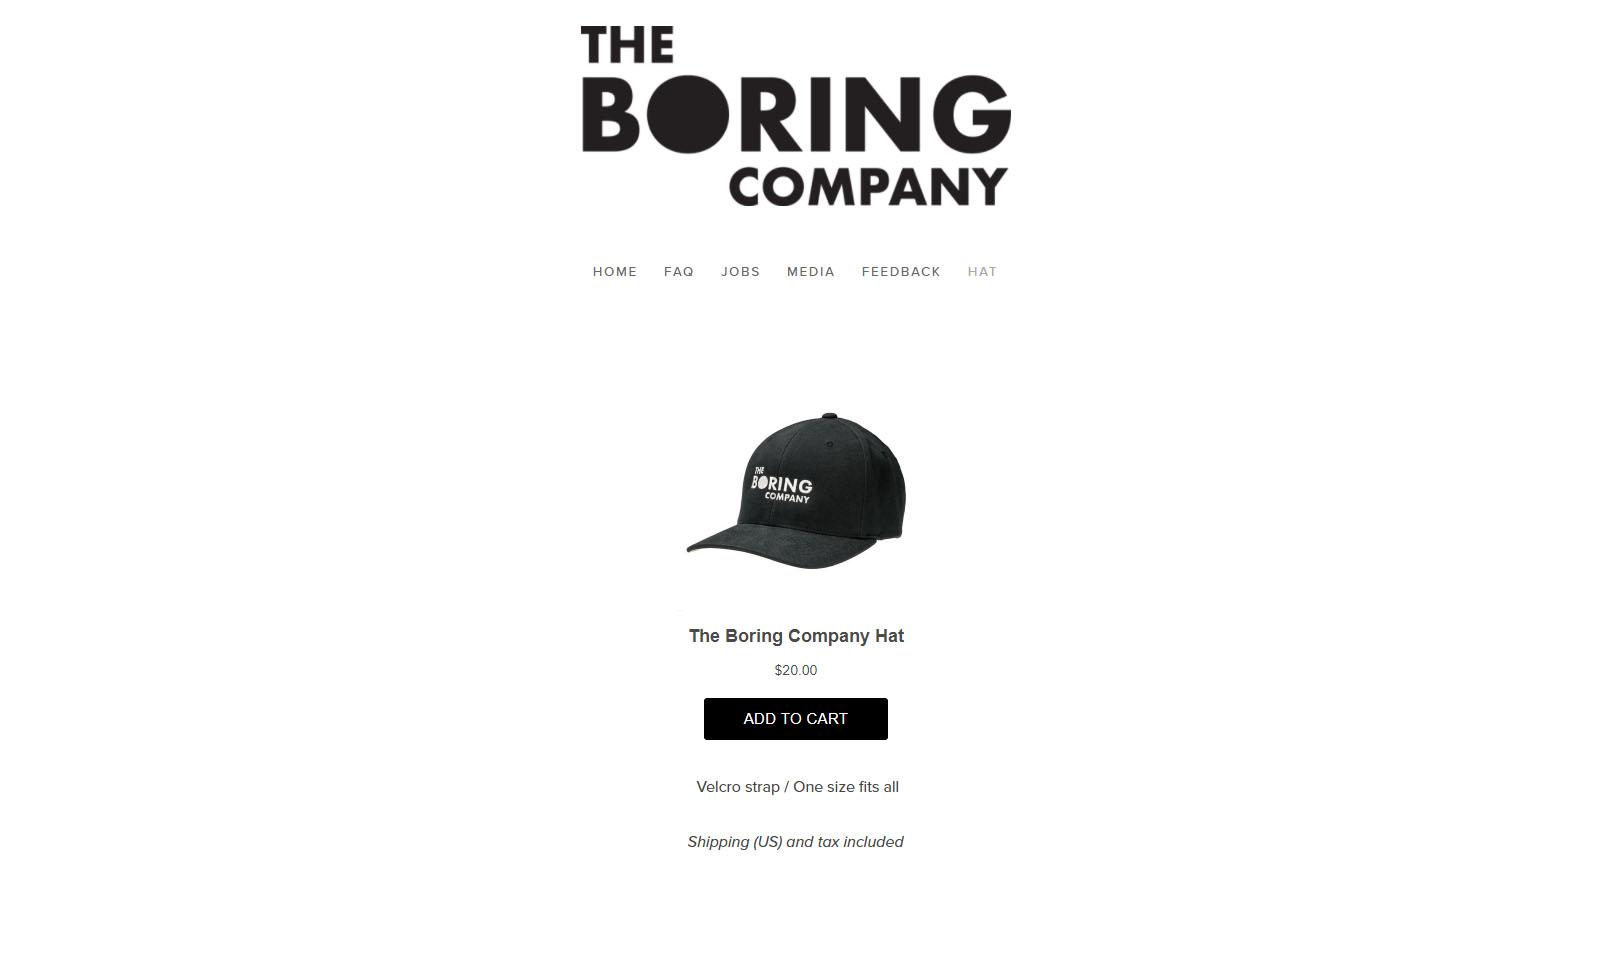 Elon Musk The Hat Seller Merchandise Sales Raise 300k